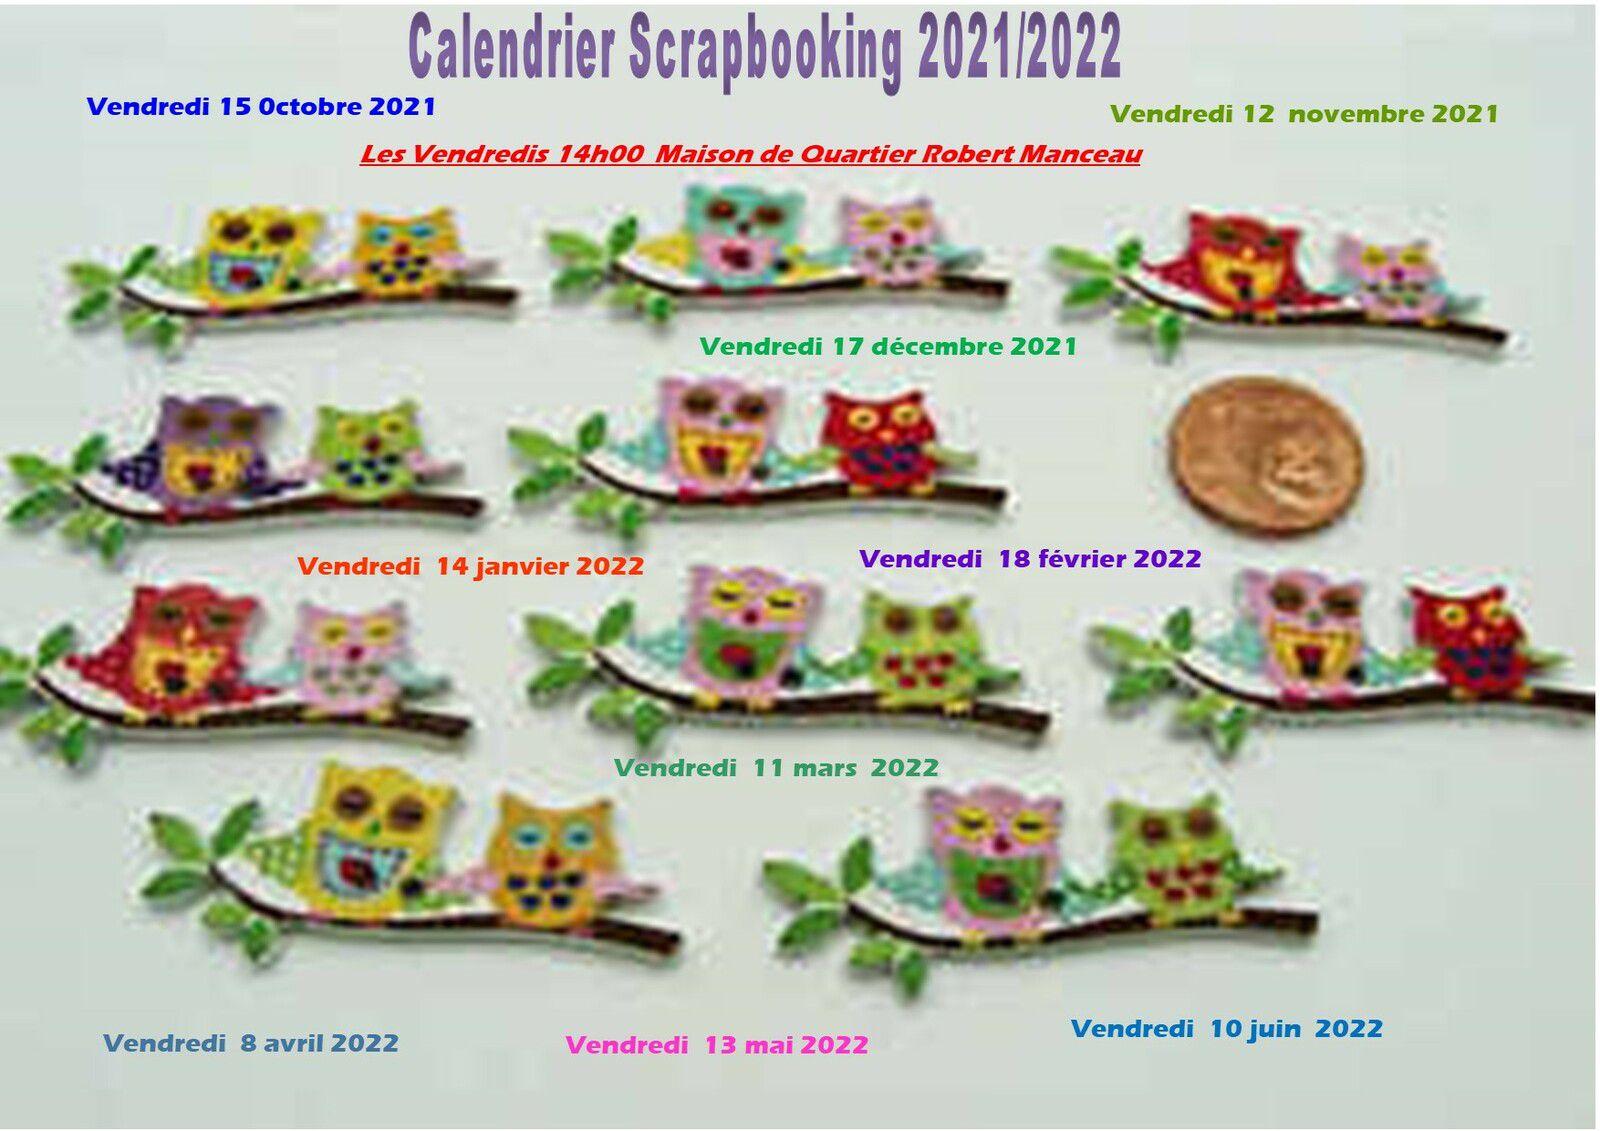 Calendrier Scrapbooking 2021/2022